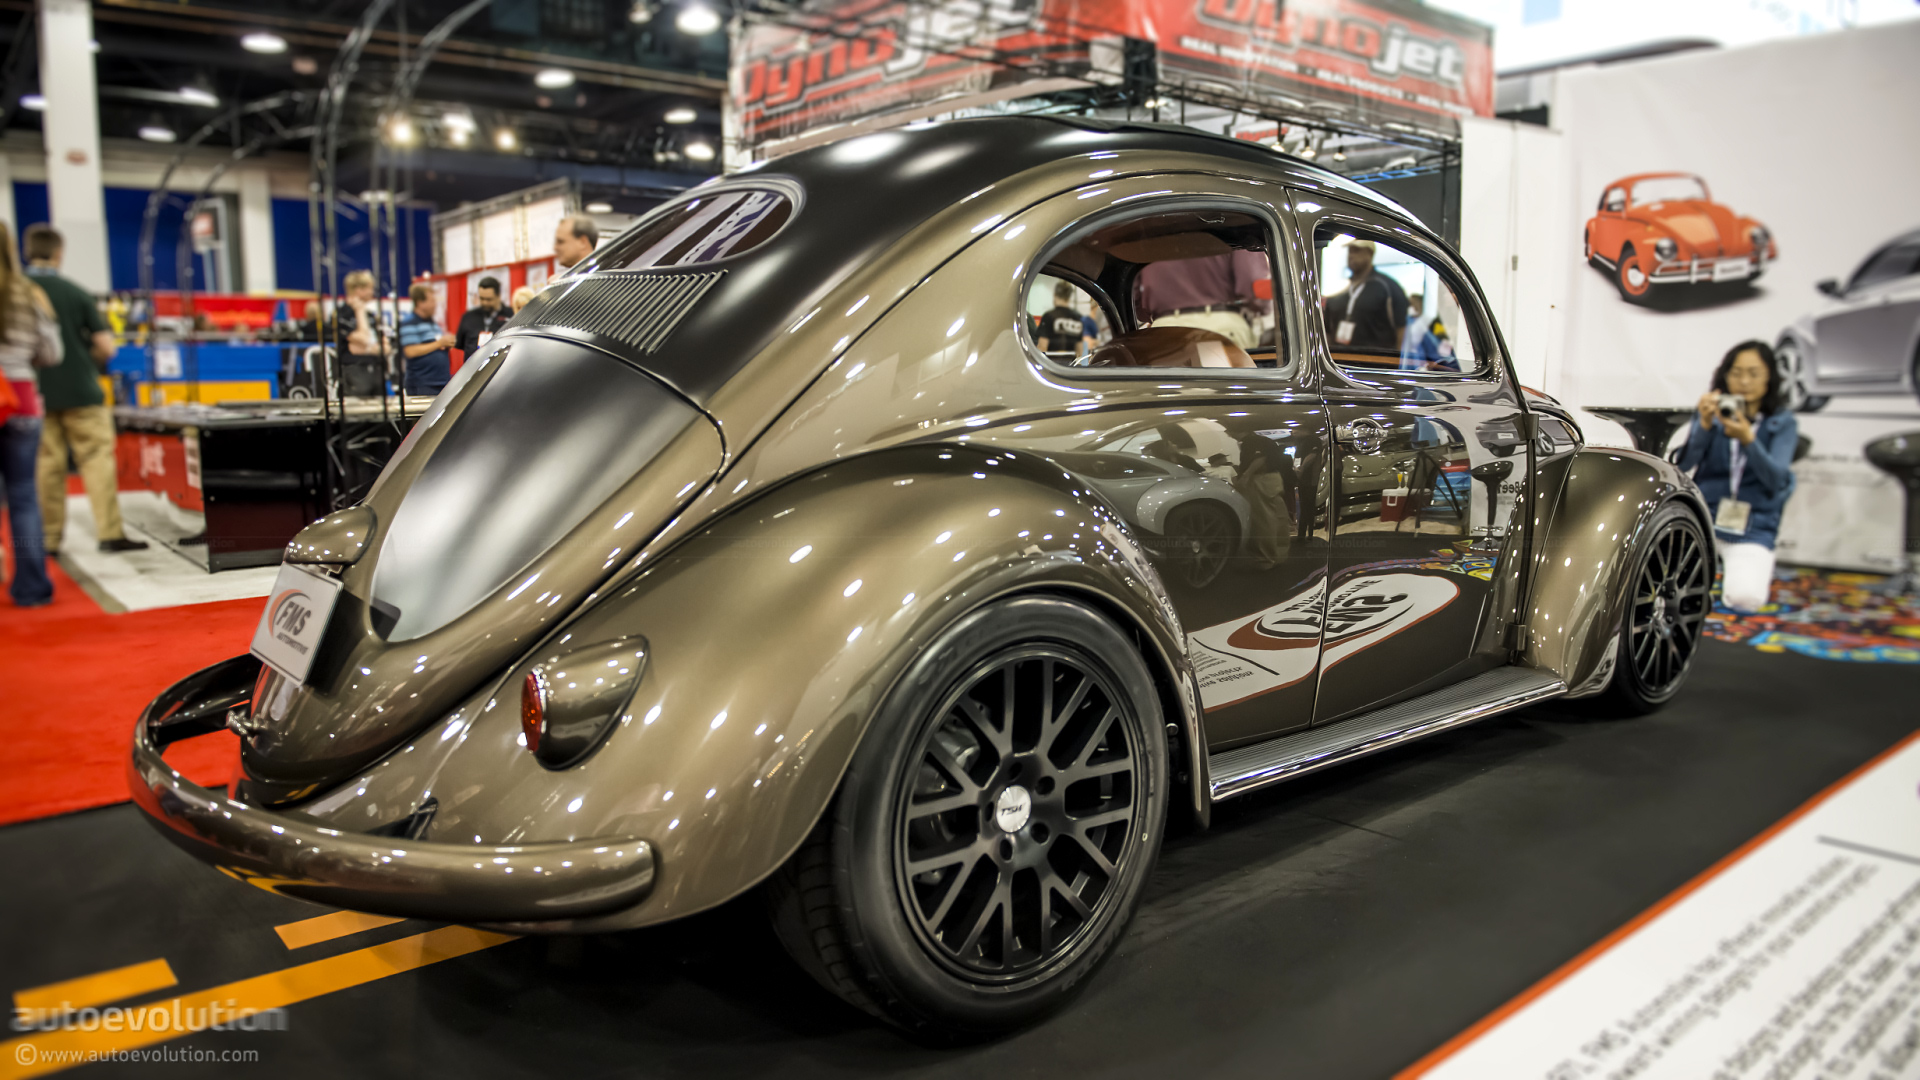 2012 SEMA: 1956 VW Beetle by FMS Automotive [Live Photos ...